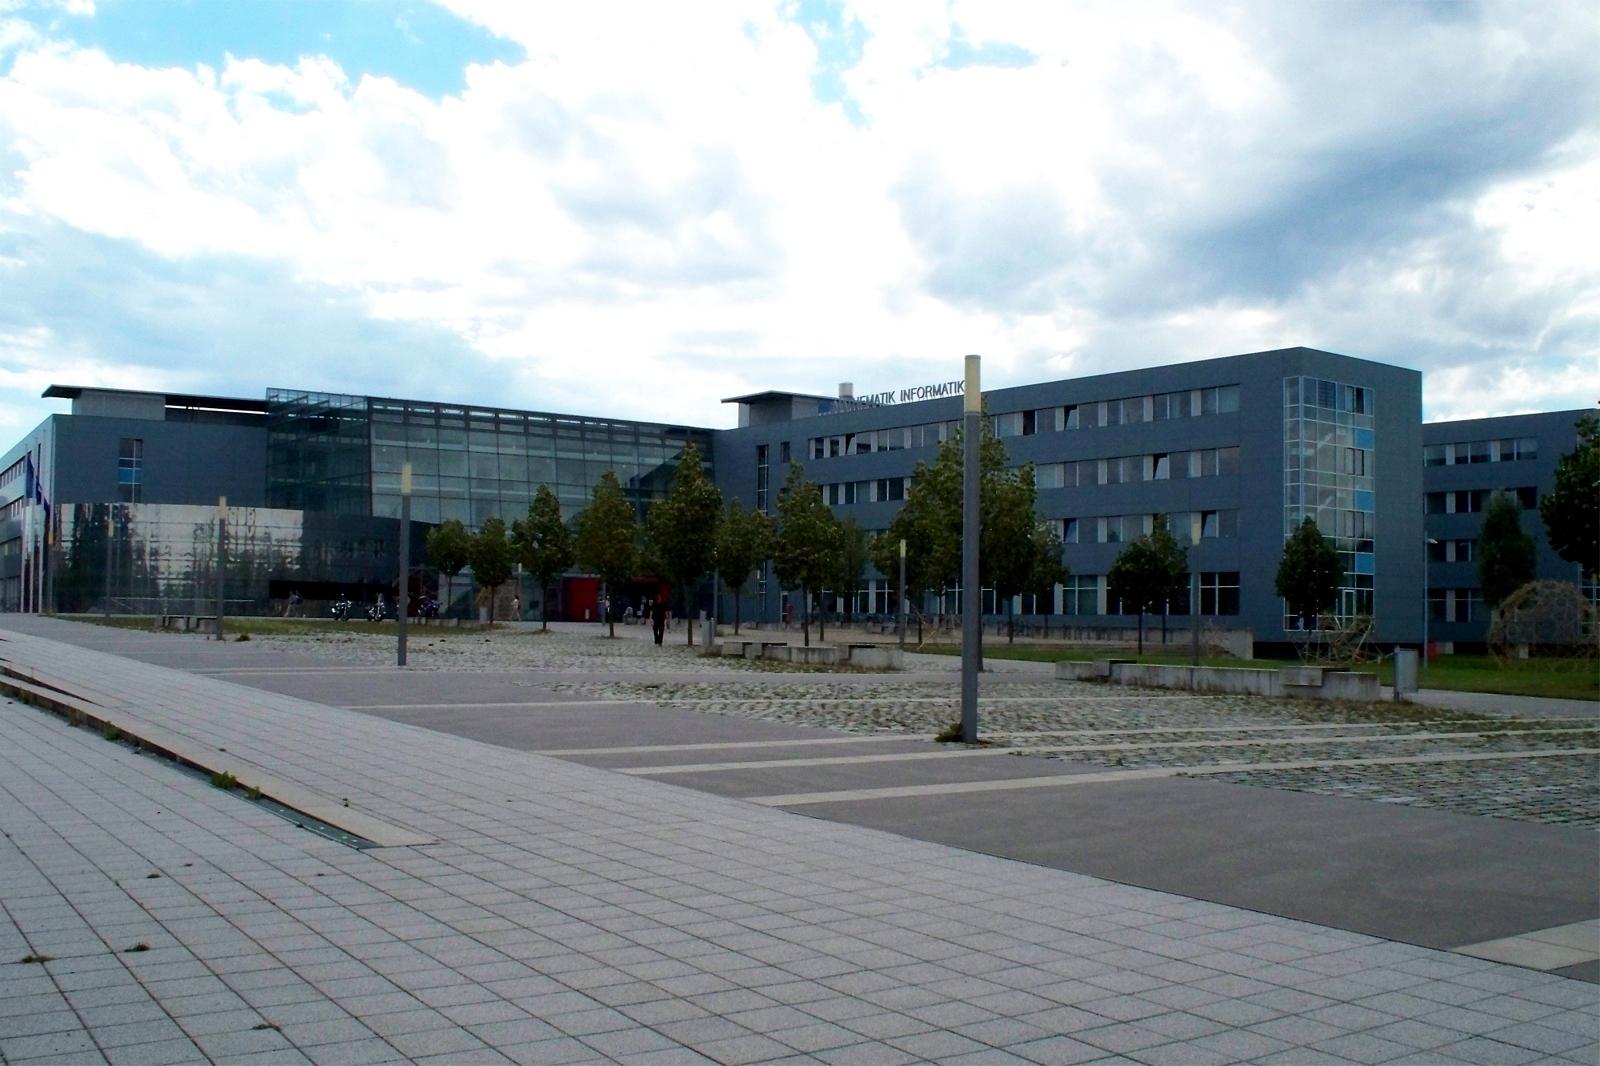 Tu München Informatik